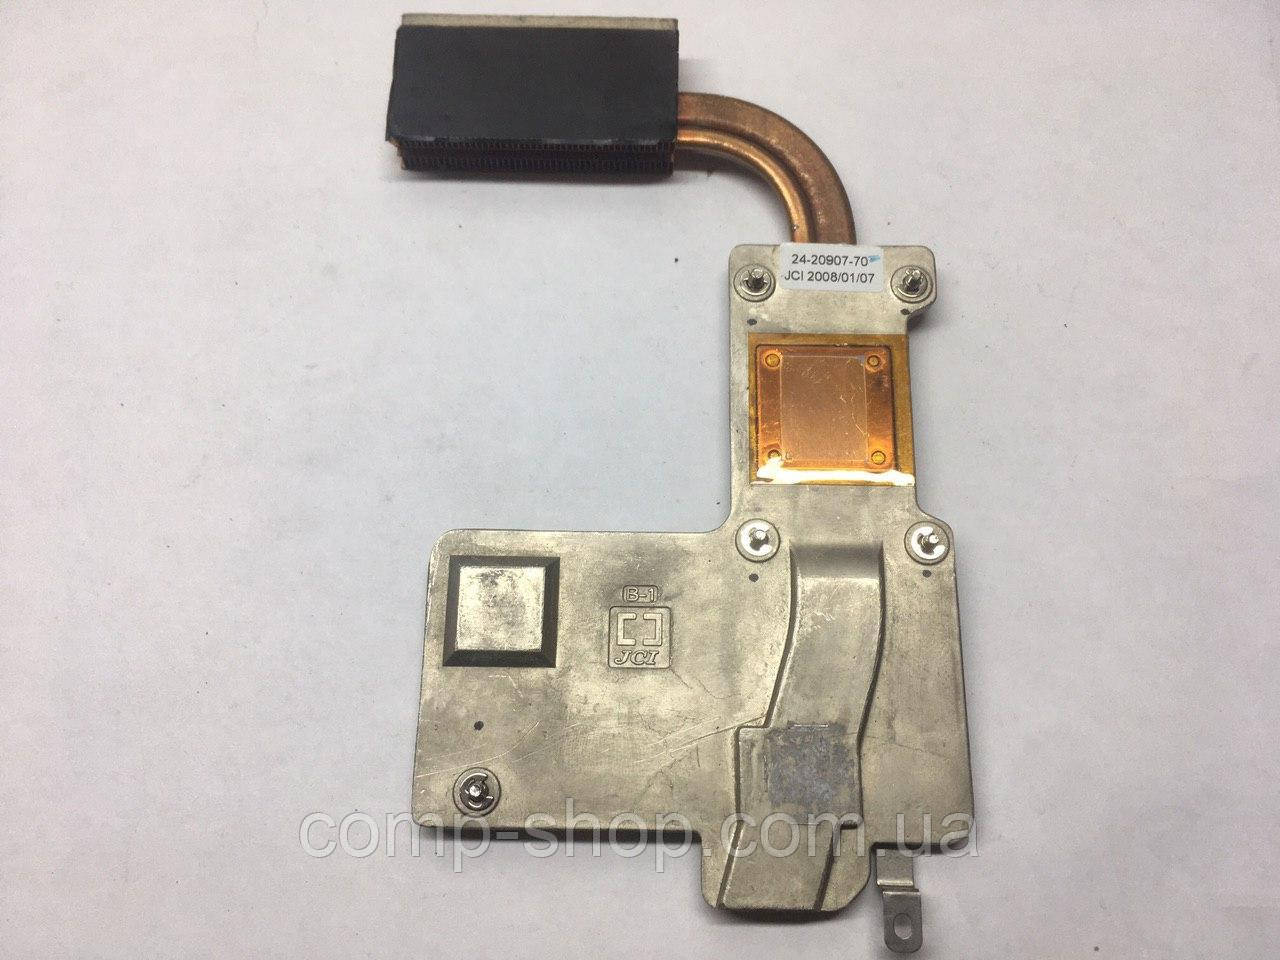 БУ Термотрубка системы охлаждения для ноутбука Fujitsu Amilo Pa 2548, 24-20907-70 (Оригинал)